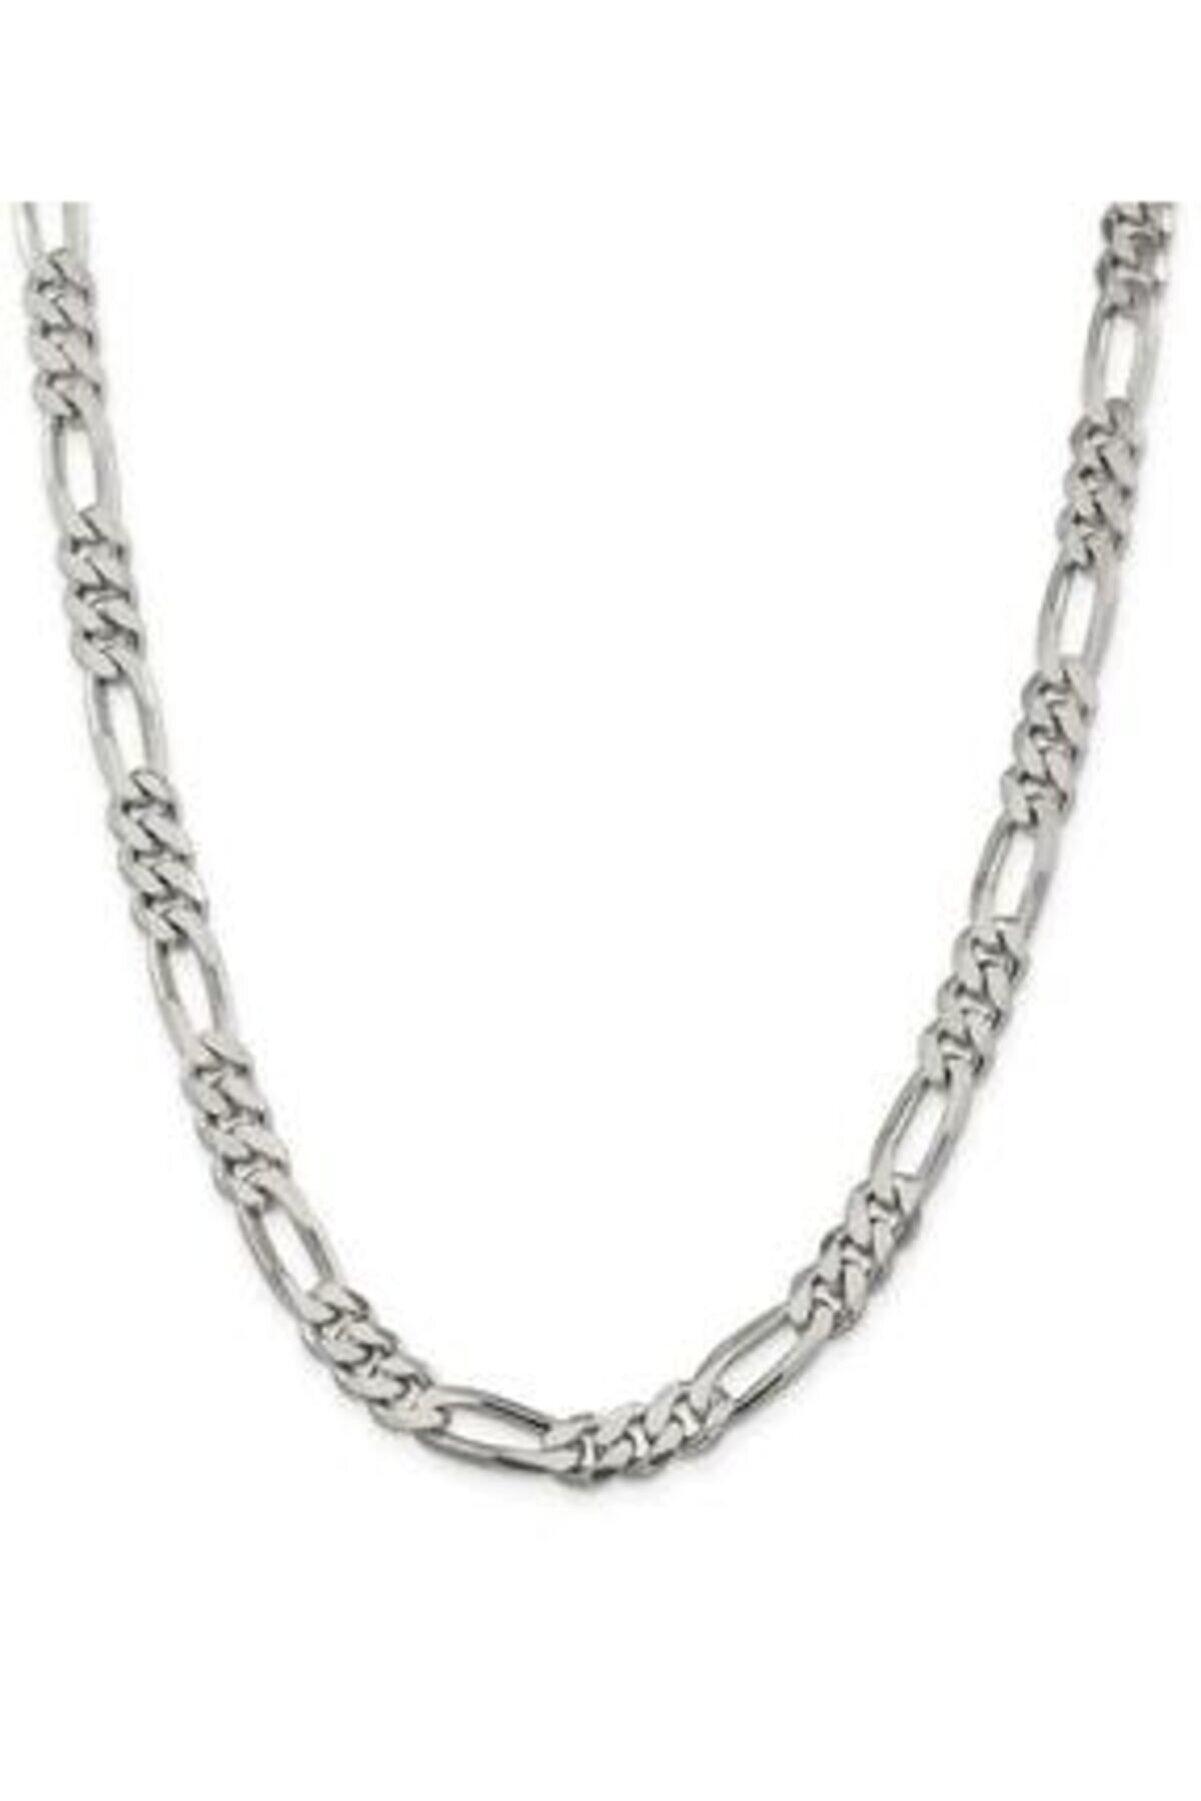 ENCİLİ SİLVER Erkek Silver Encili Gümüş Figaro Zincir Kolye 60 cm 925 Ayar